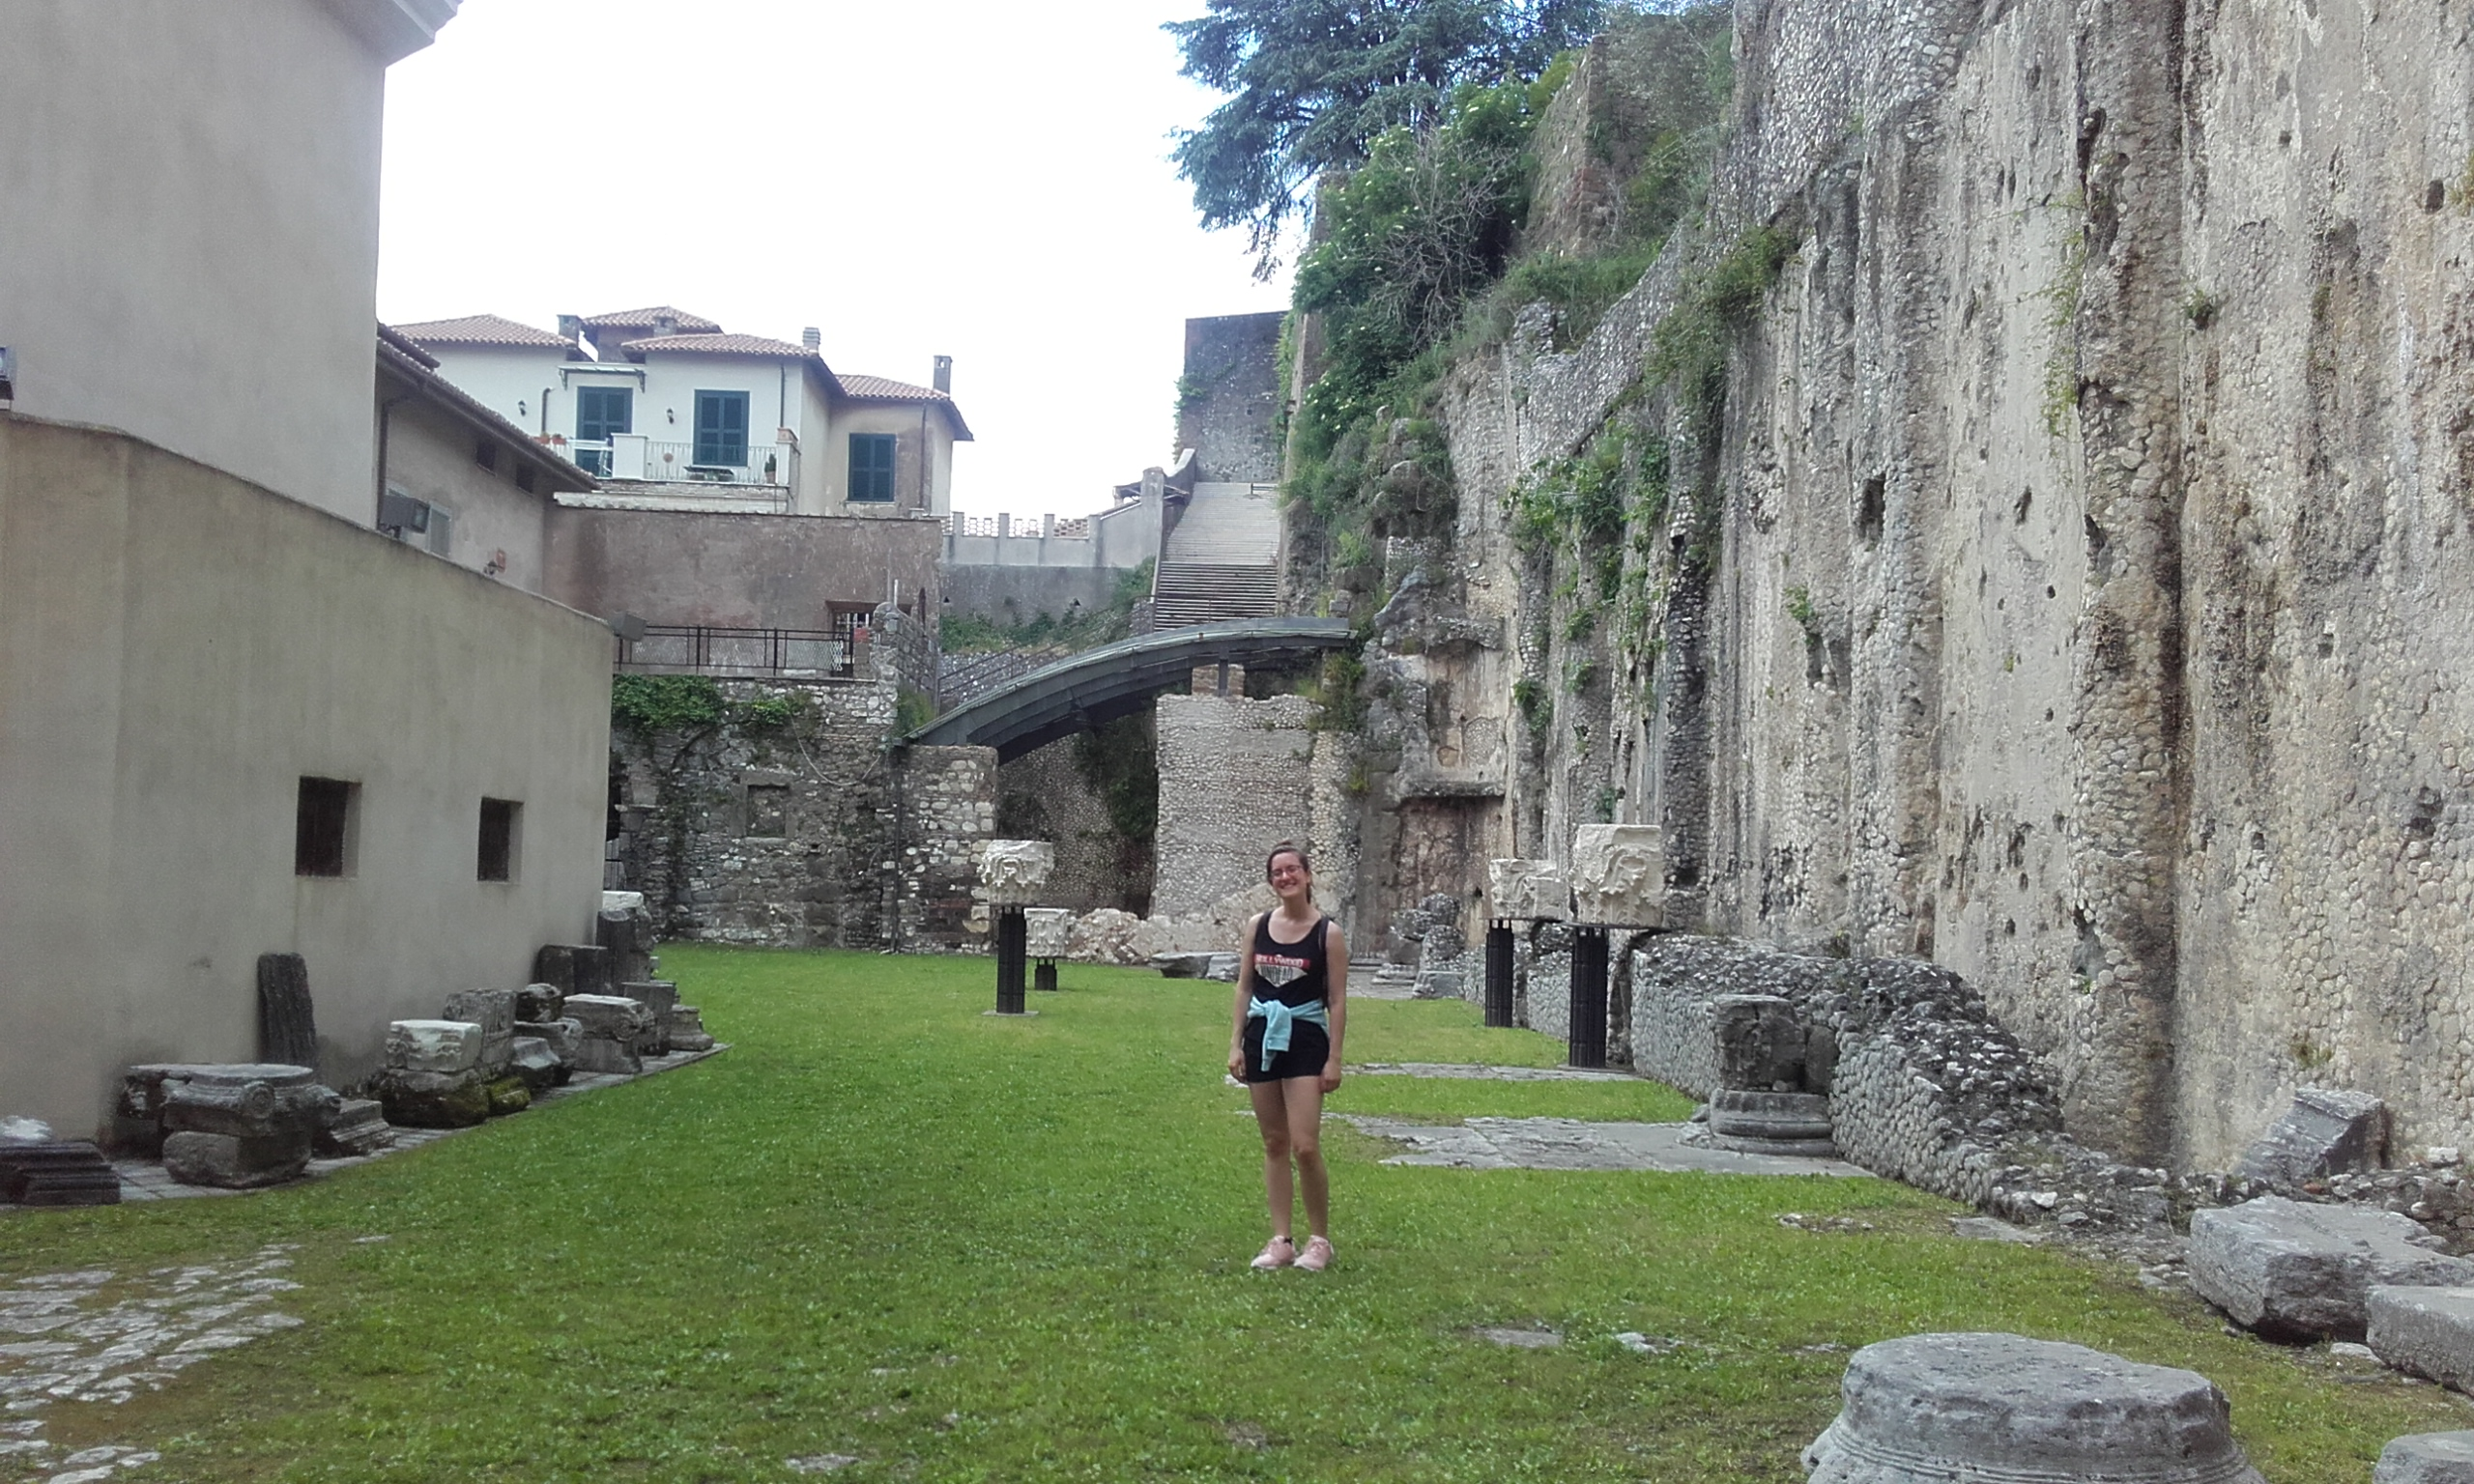 Sitio arqueológico del Antro delle Sorti